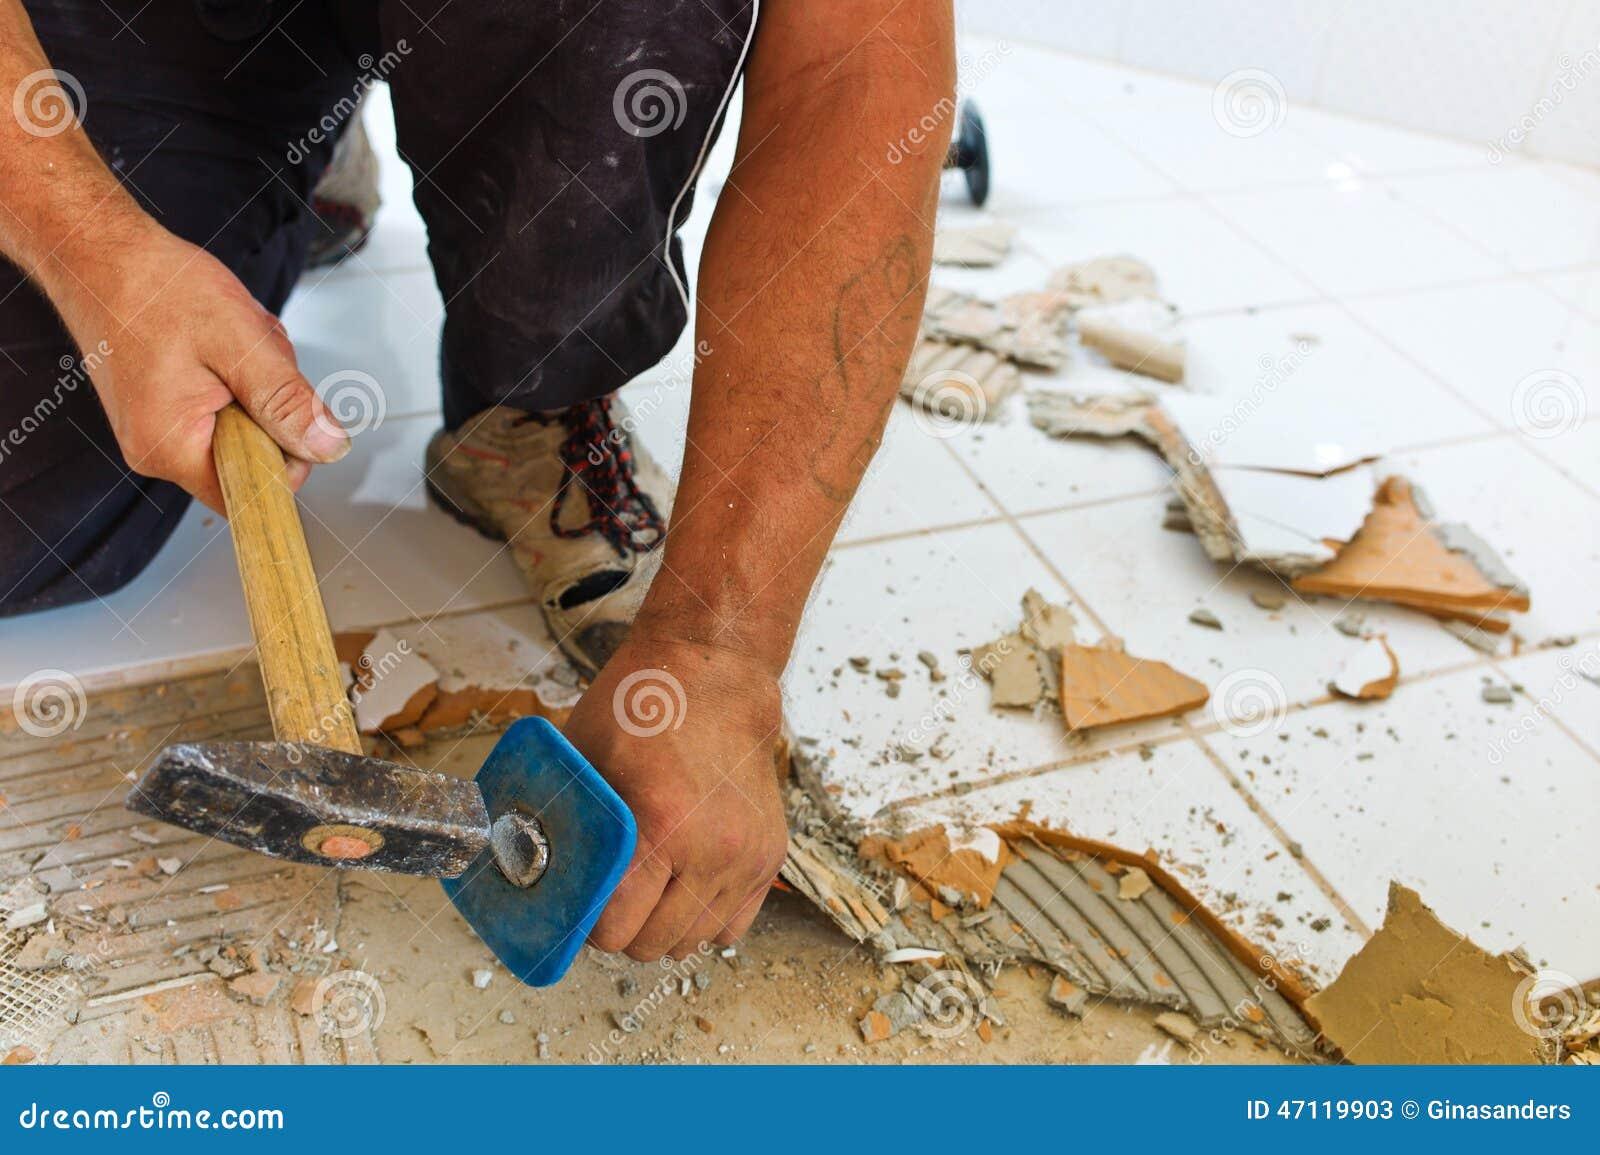 badezimmer ist renvoviert stockfoto - bild: 47119903, Badezimmer ideen